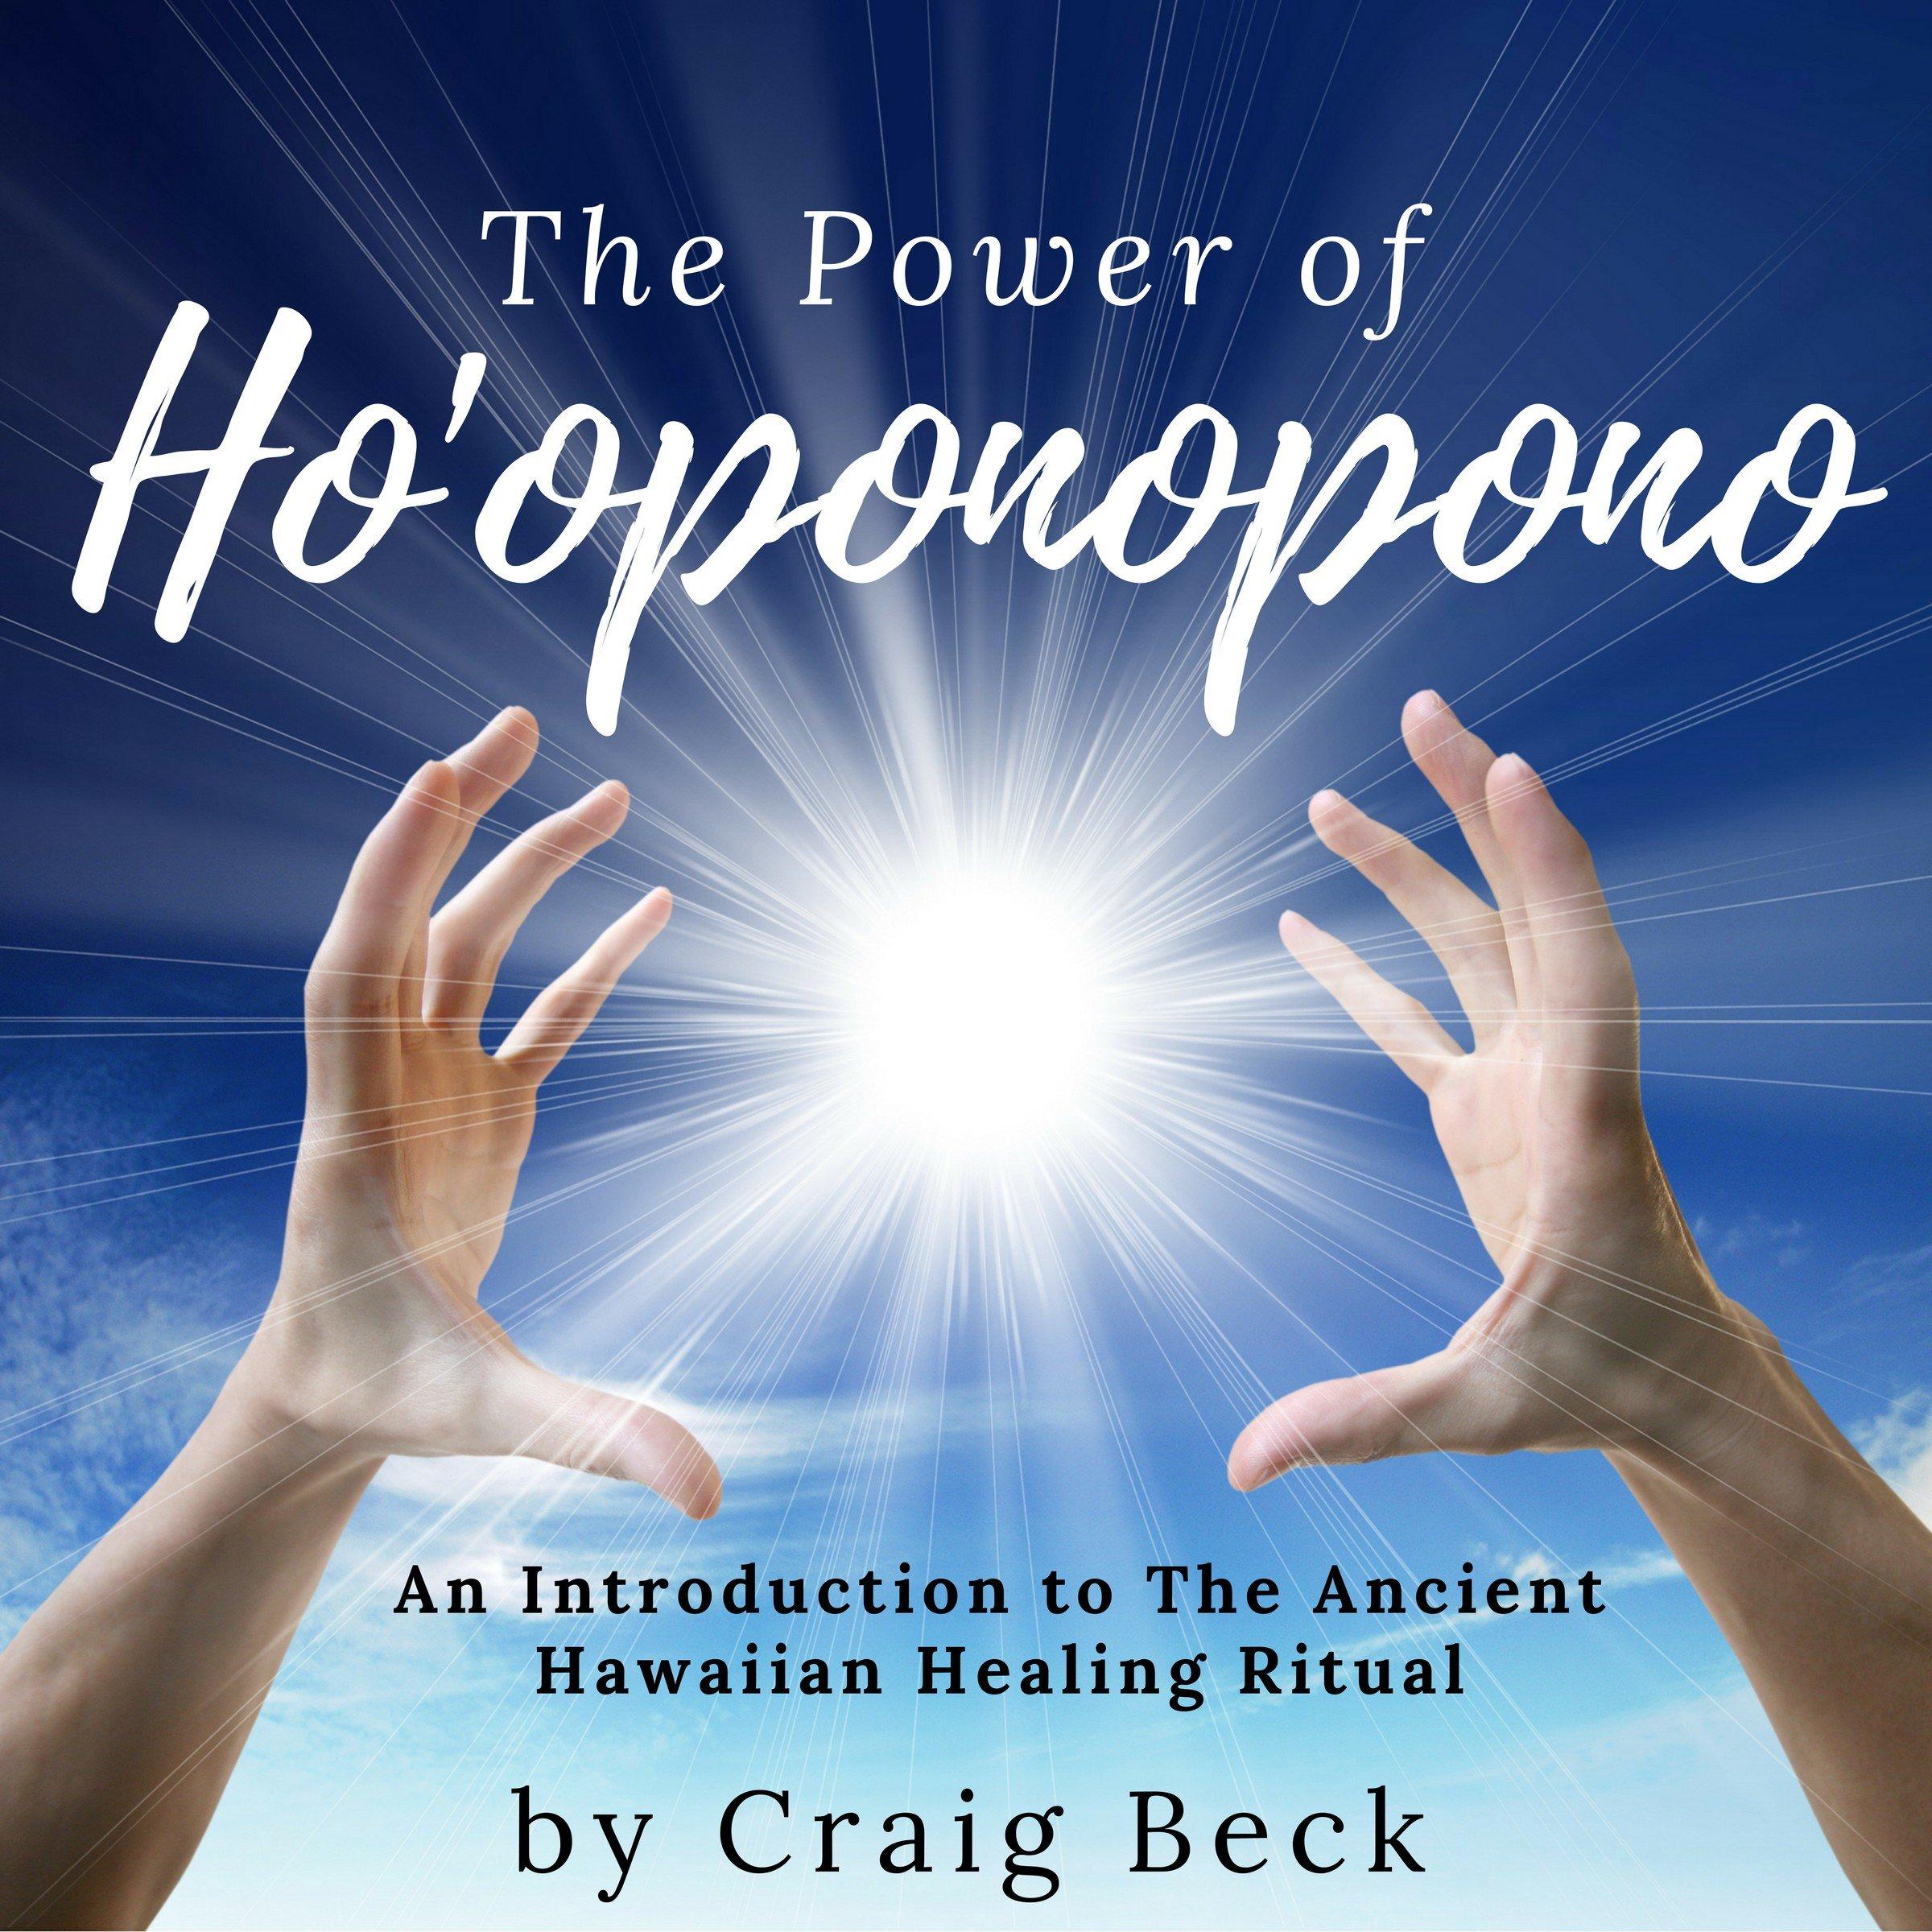 The Power Of Ho'oponopono  An Introduction To The Ancient Hawaiian Healing Ritual